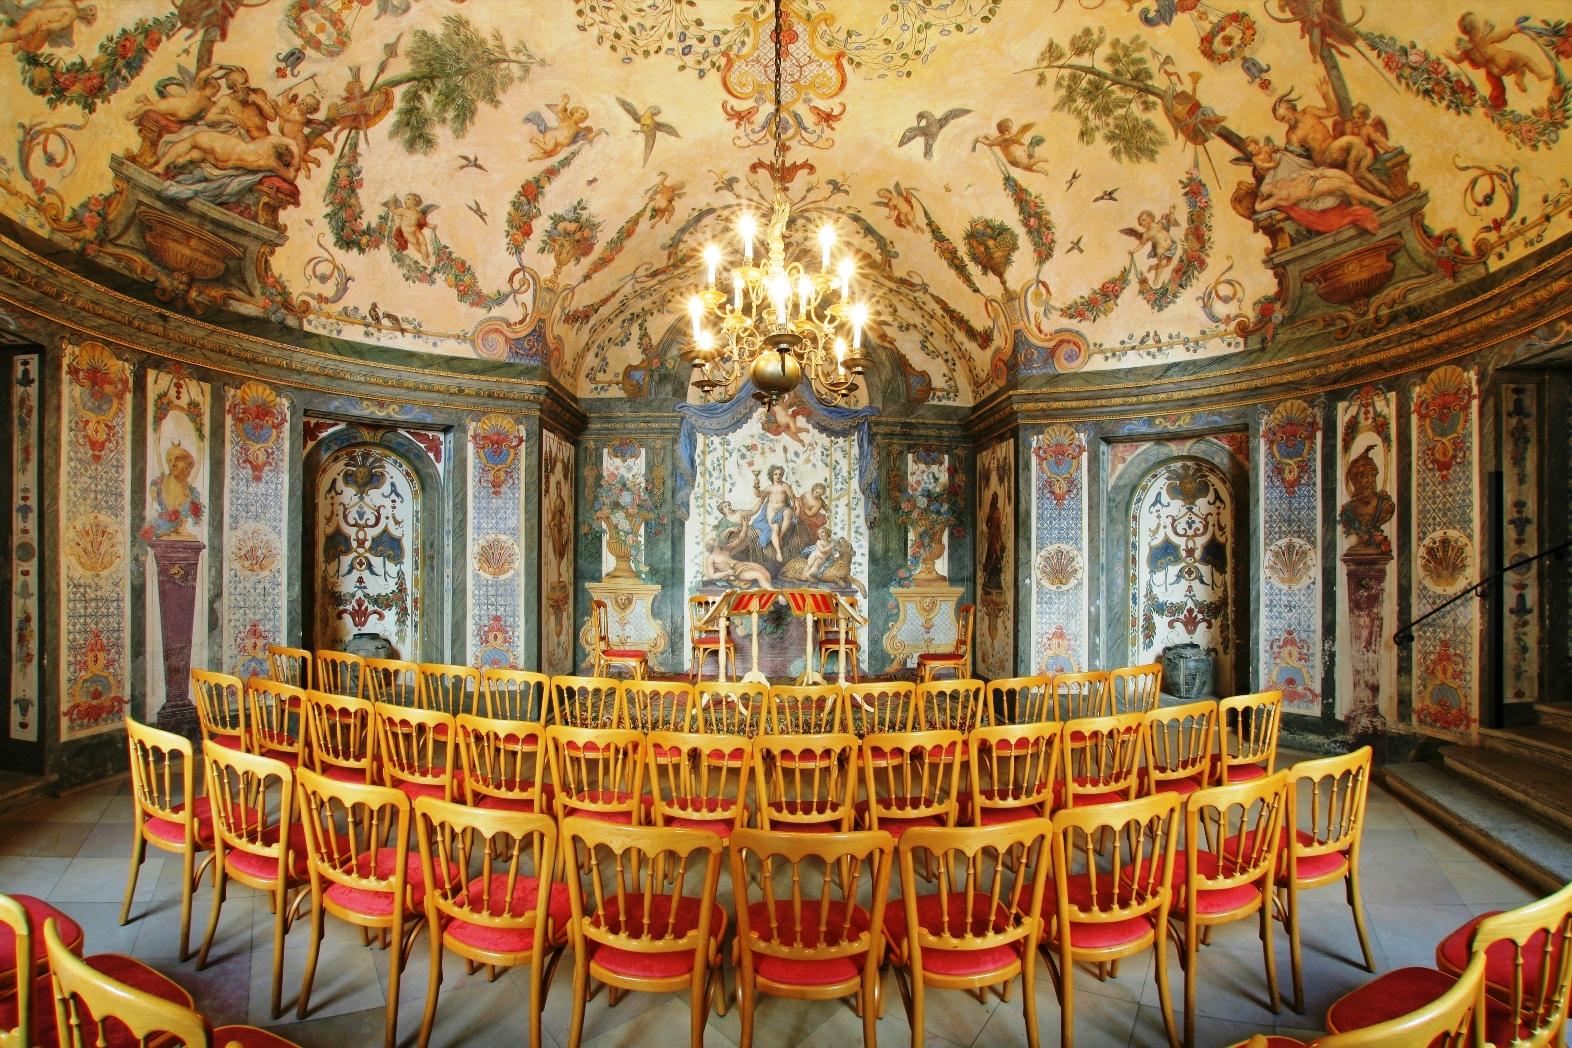 Sala Terrena with beautiful frescos